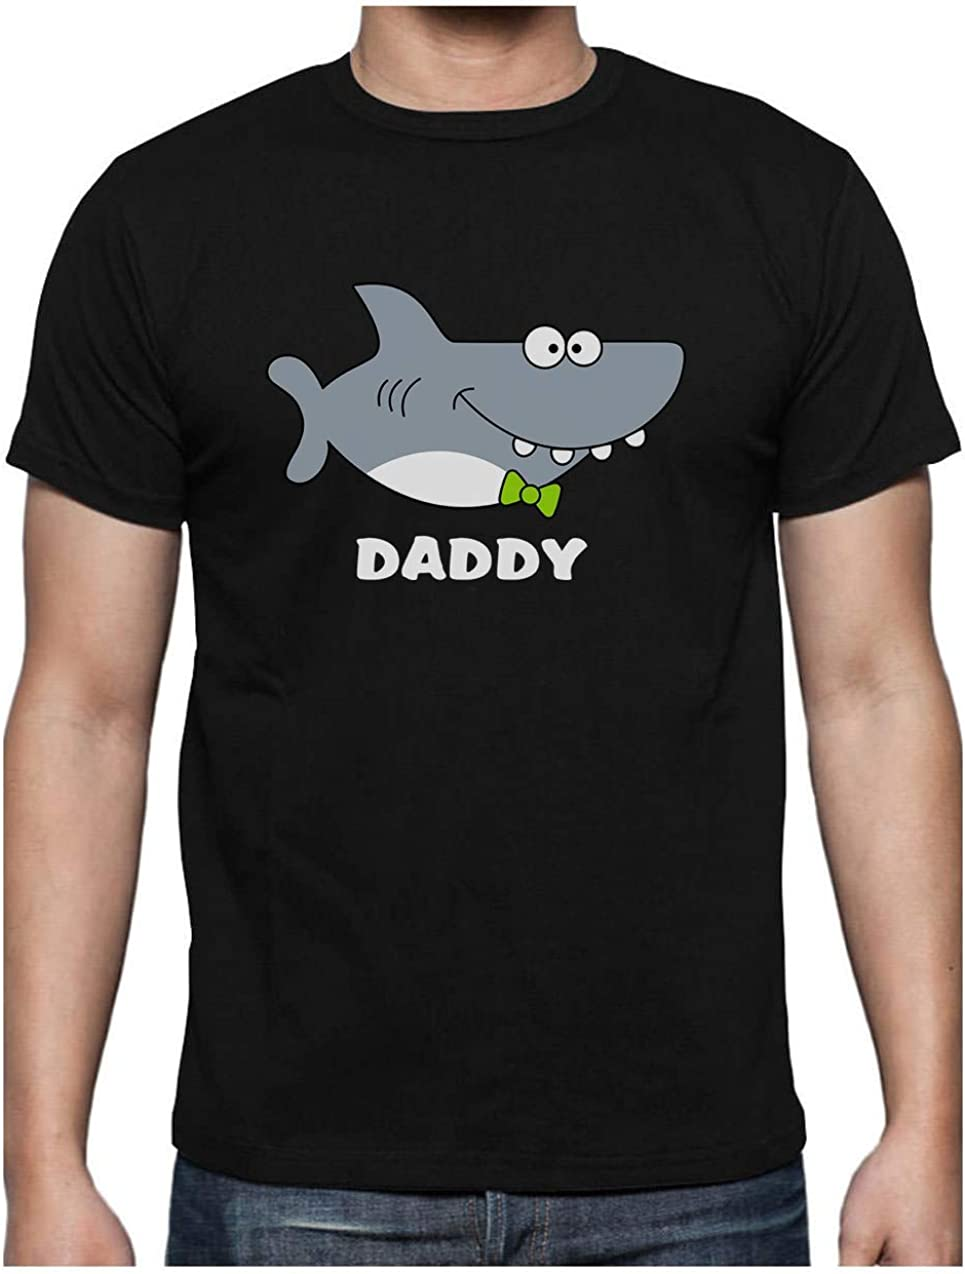 Green Turtle T-Shirts Camiseta para Hombre - Regalos para Padres, Regalos para Papá Primerizo - Daddy Shark -